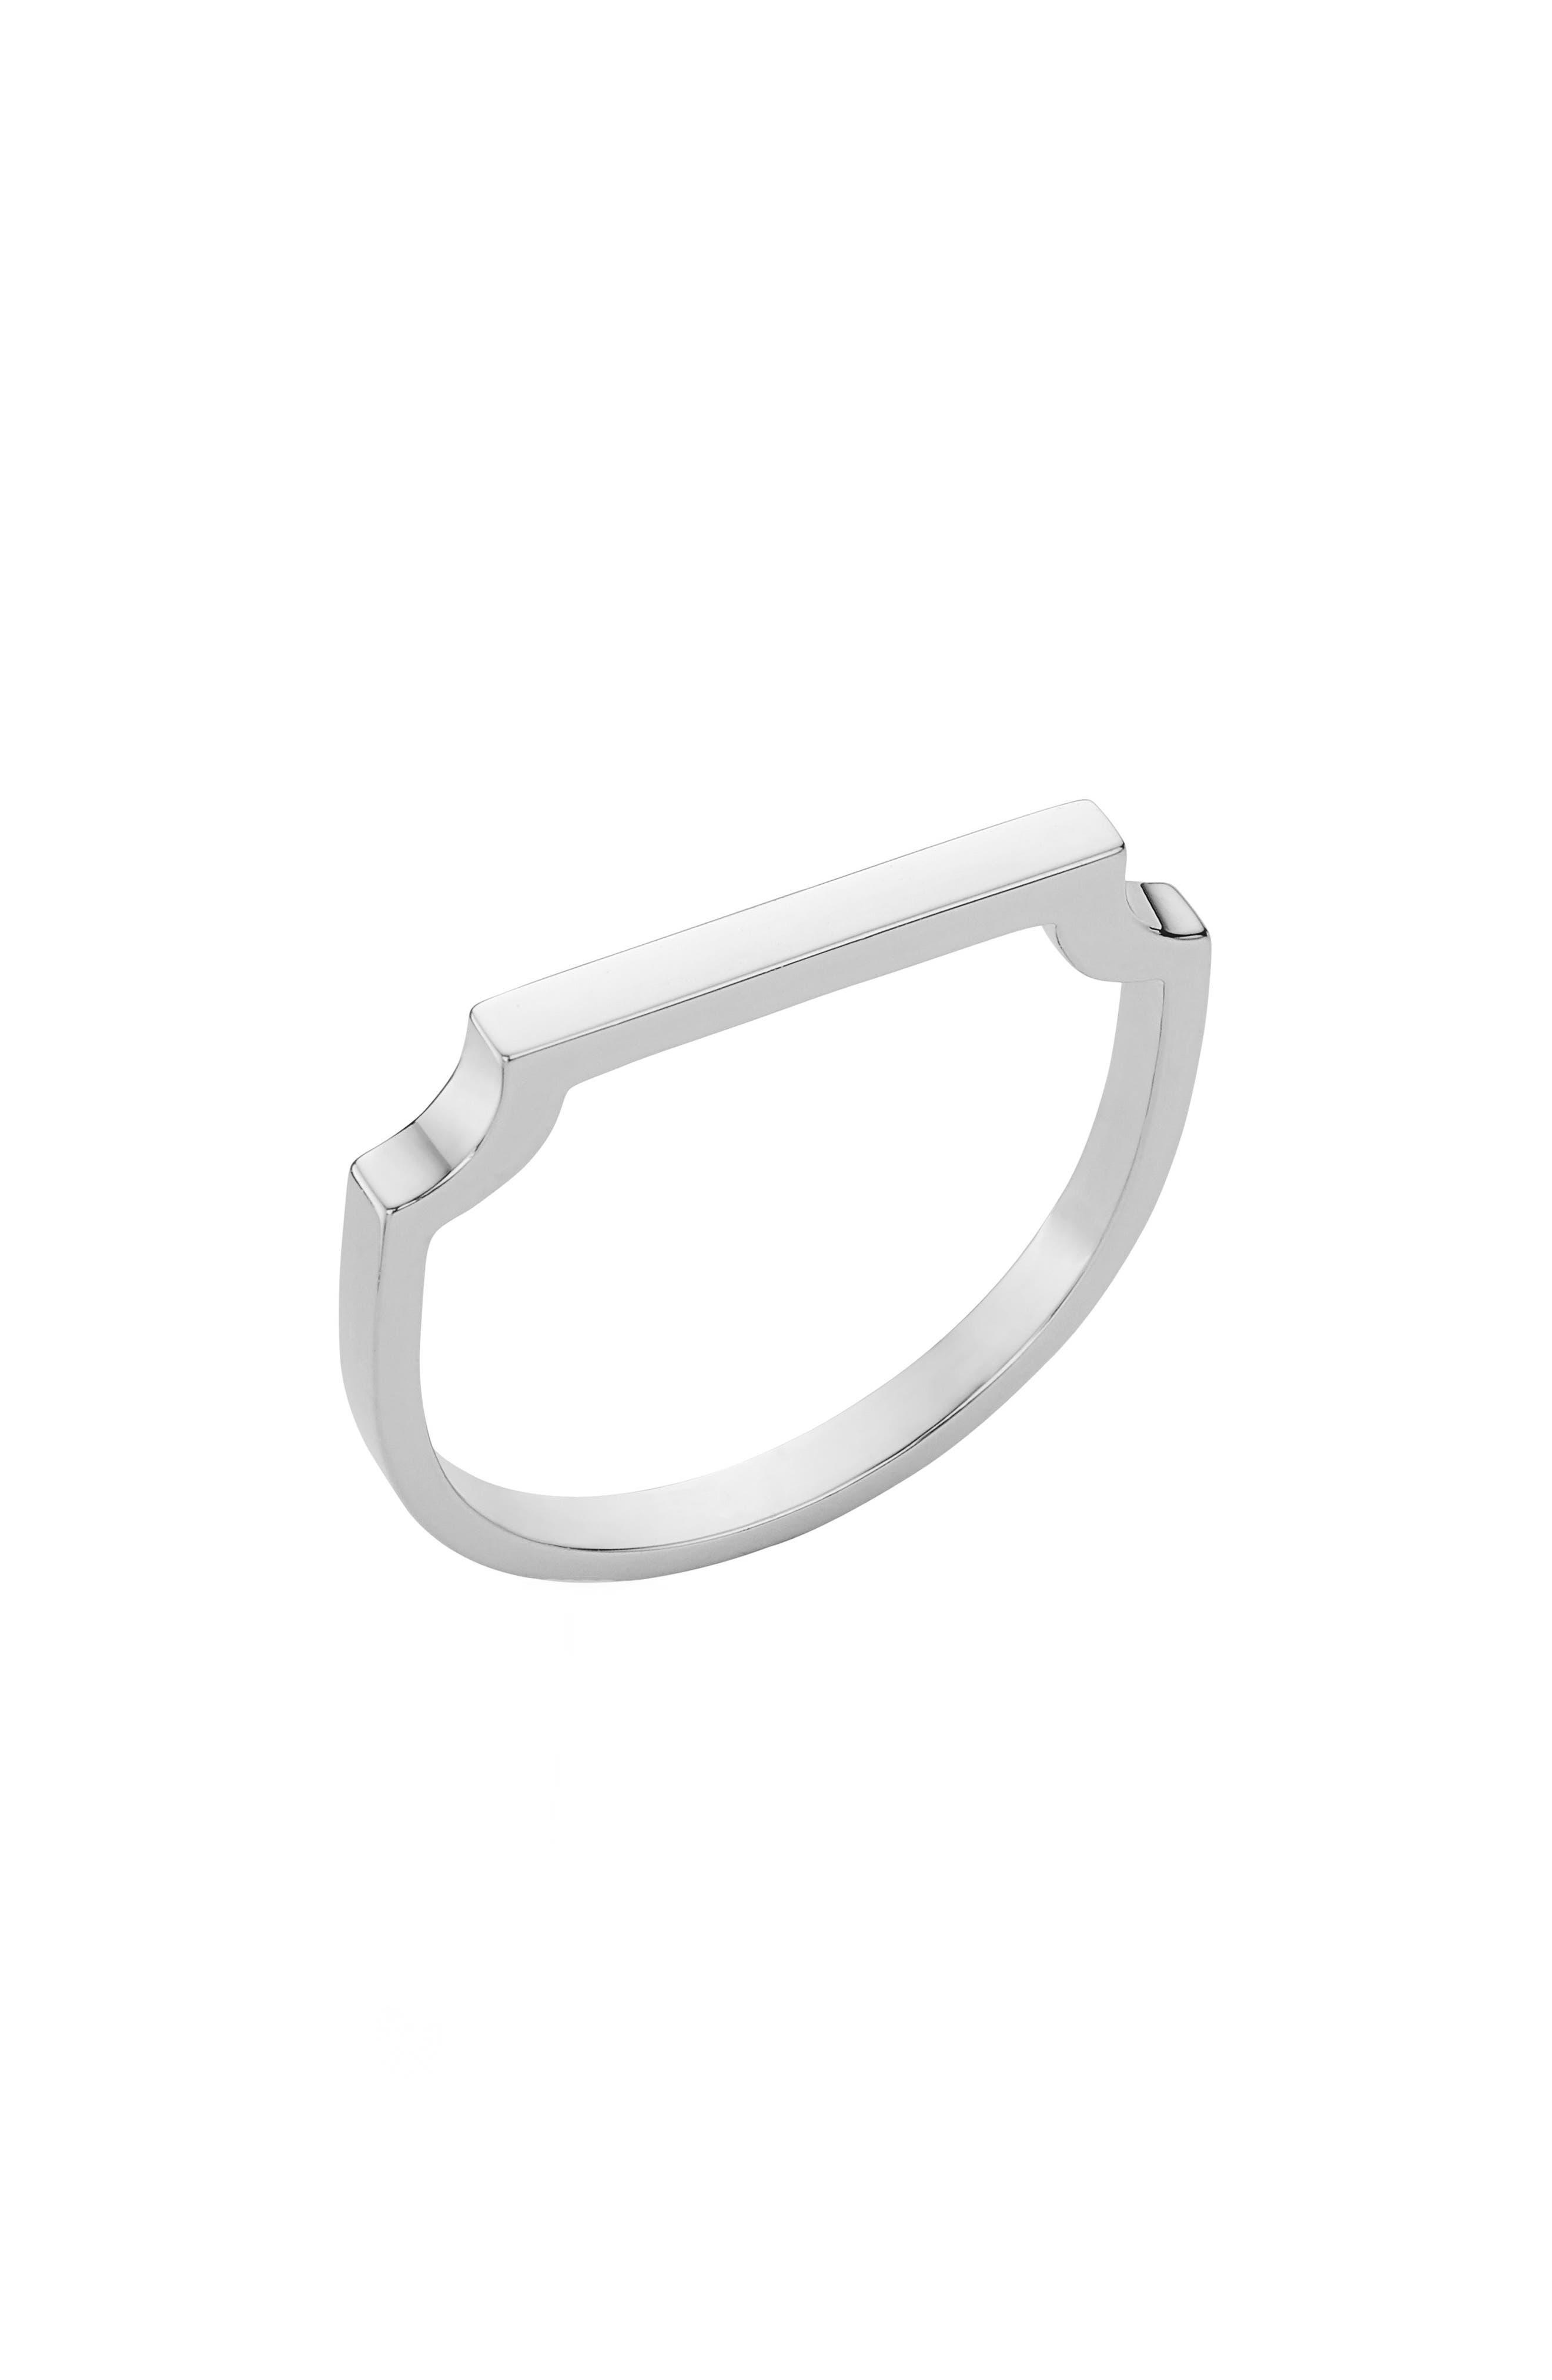 MONICA VINADER Signature Thin Ring, Main, color, SILVER